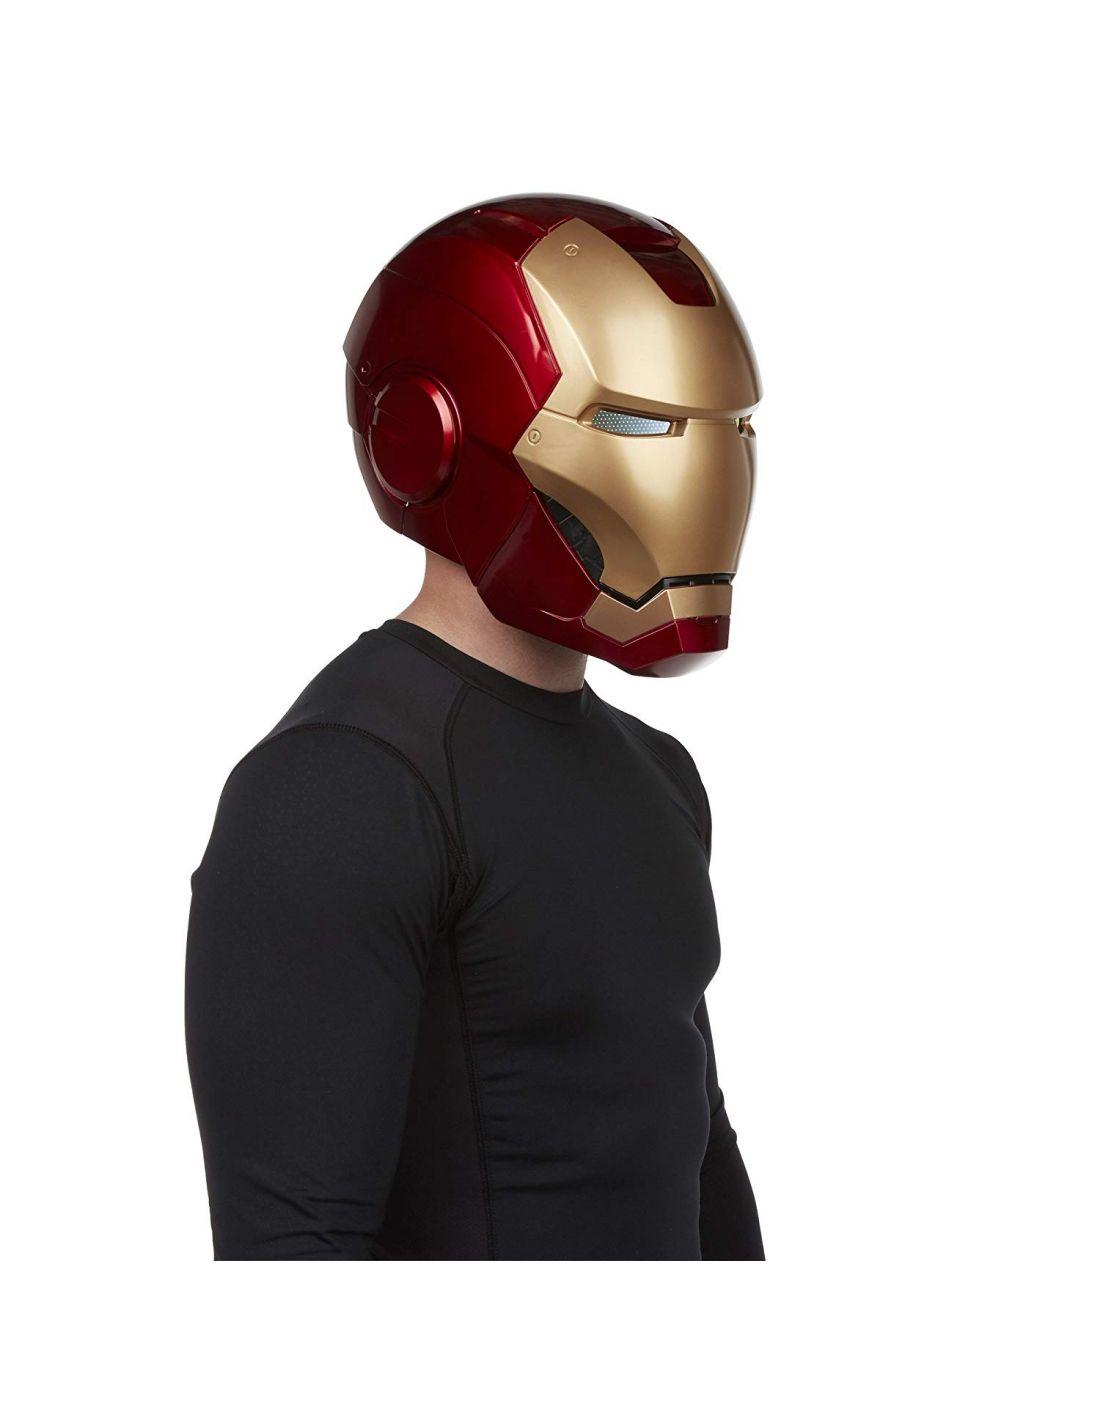 The Avengers Marvel Legends Iron Man Casco electrónico en